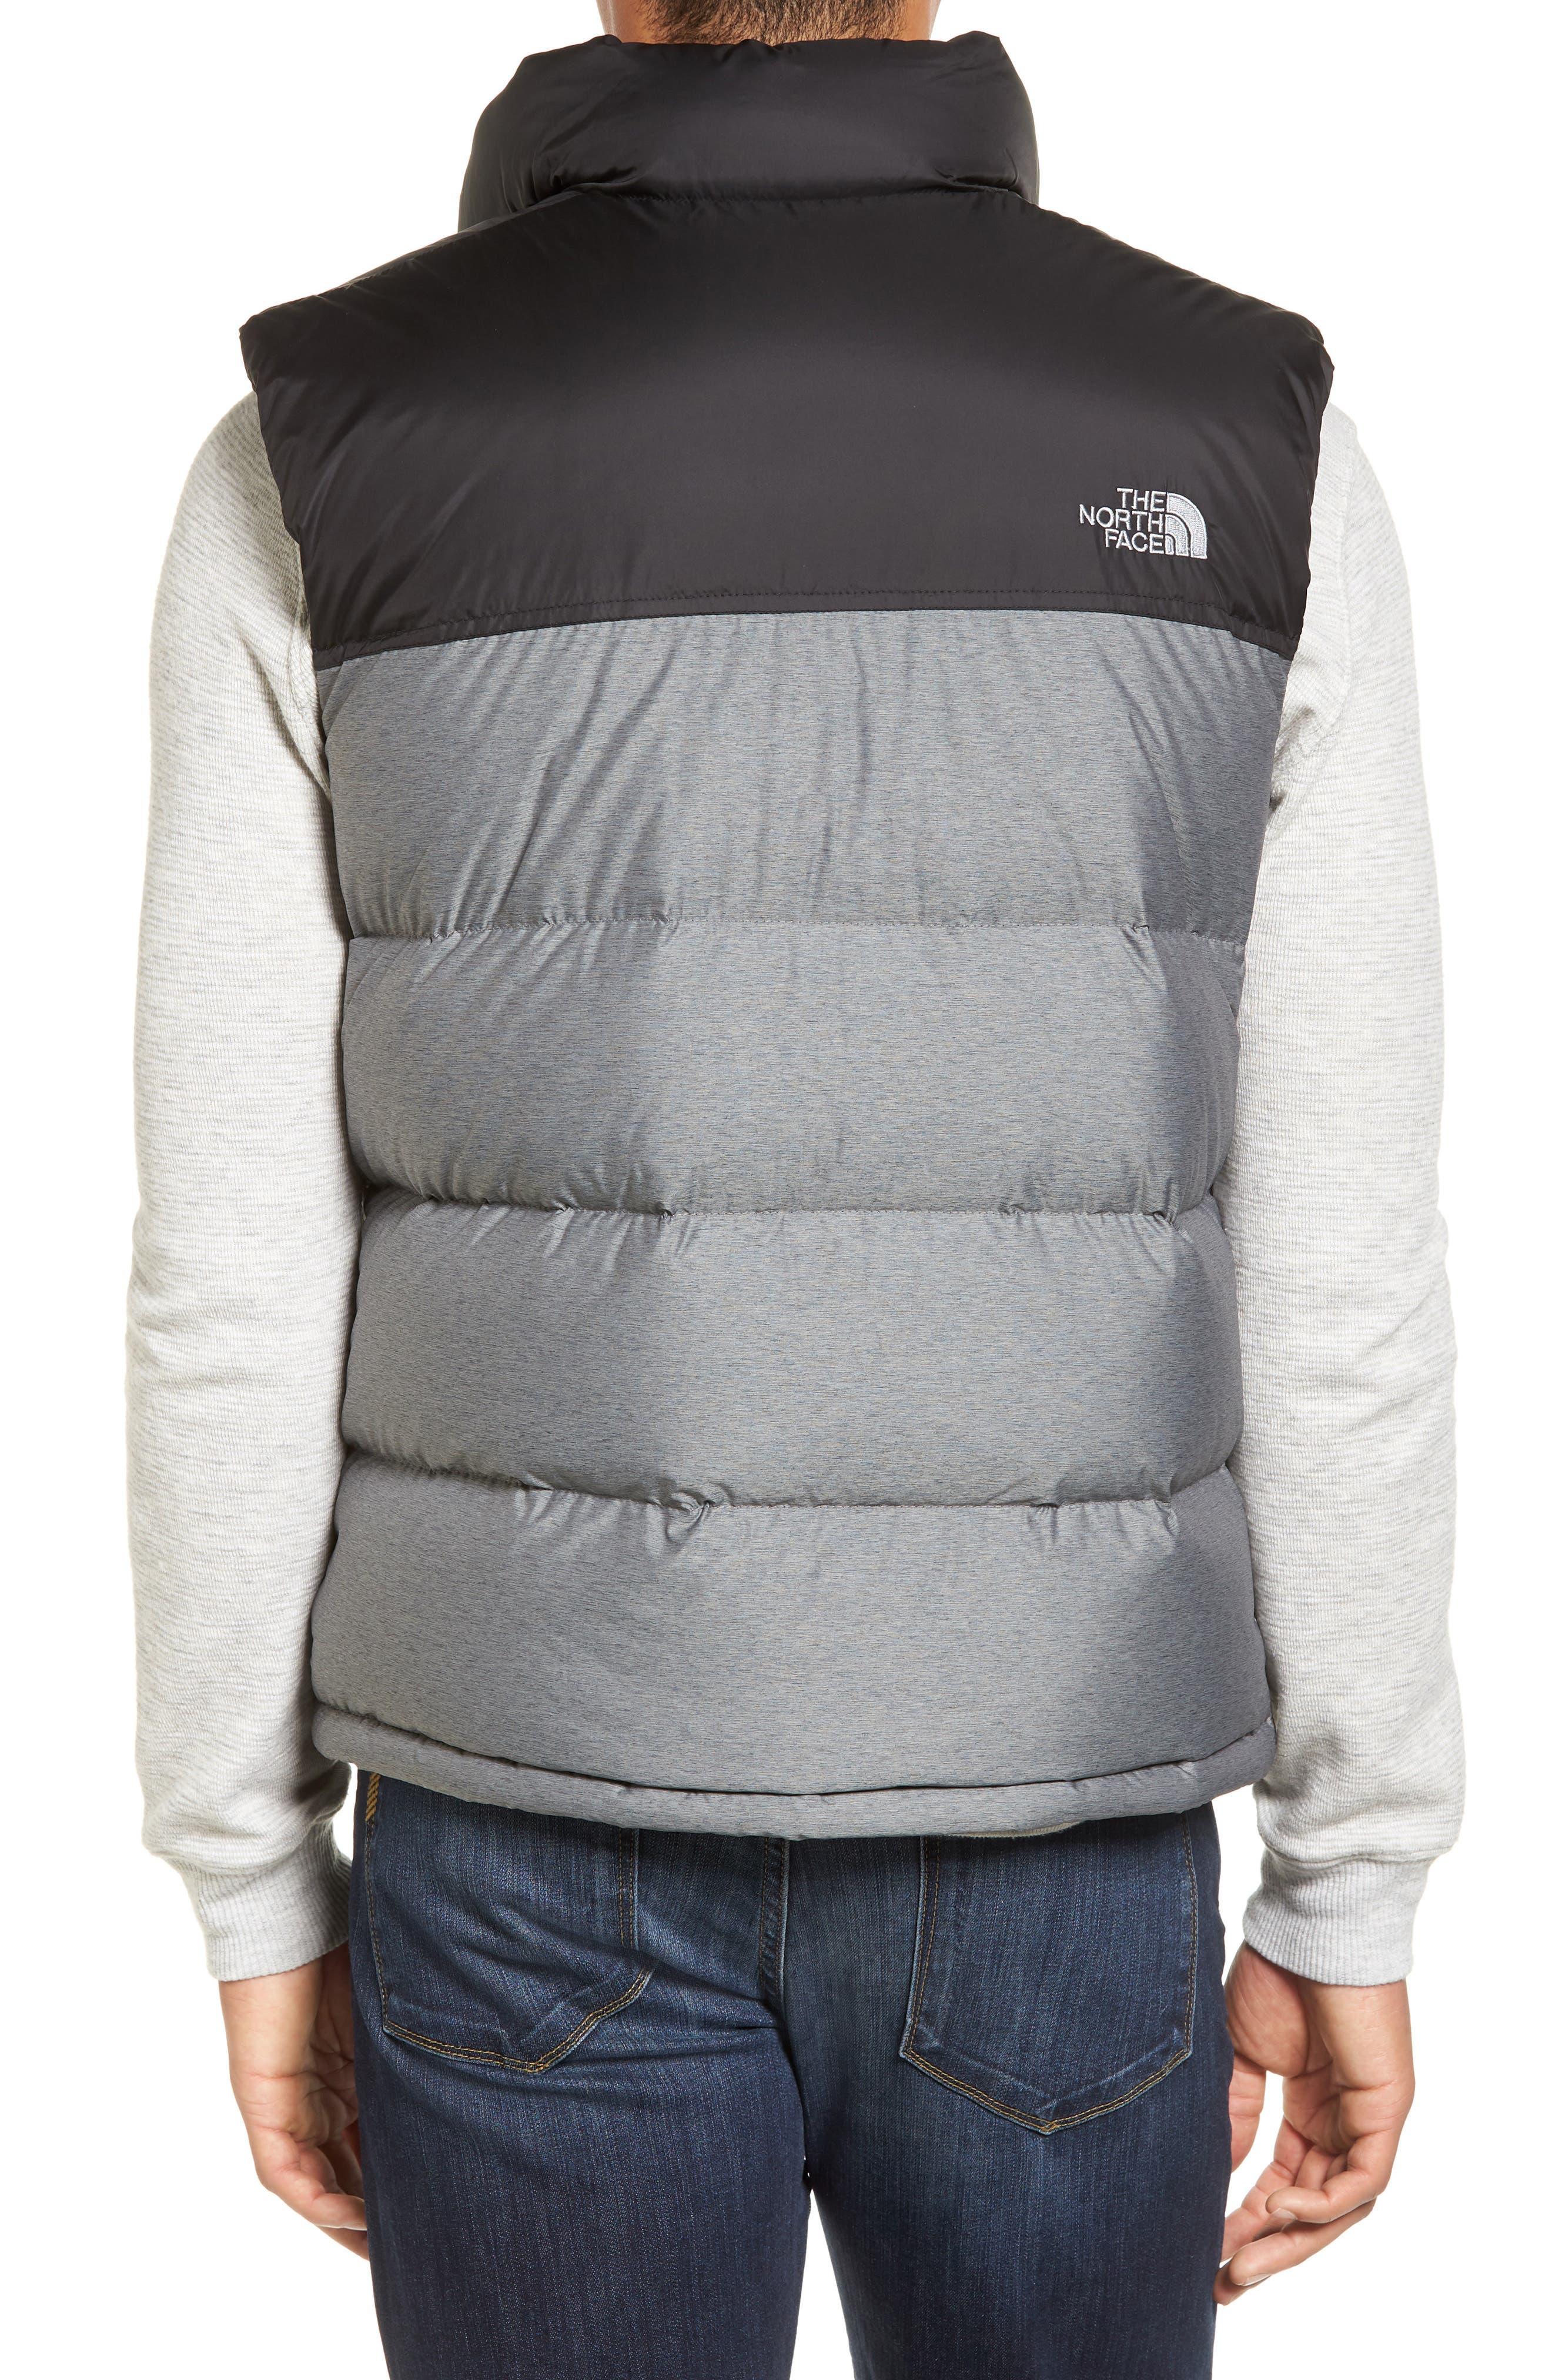 Nuptse Water Repellent Down Vest,                             Alternate thumbnail 2, color,                             Medium Grey Heather/ Black